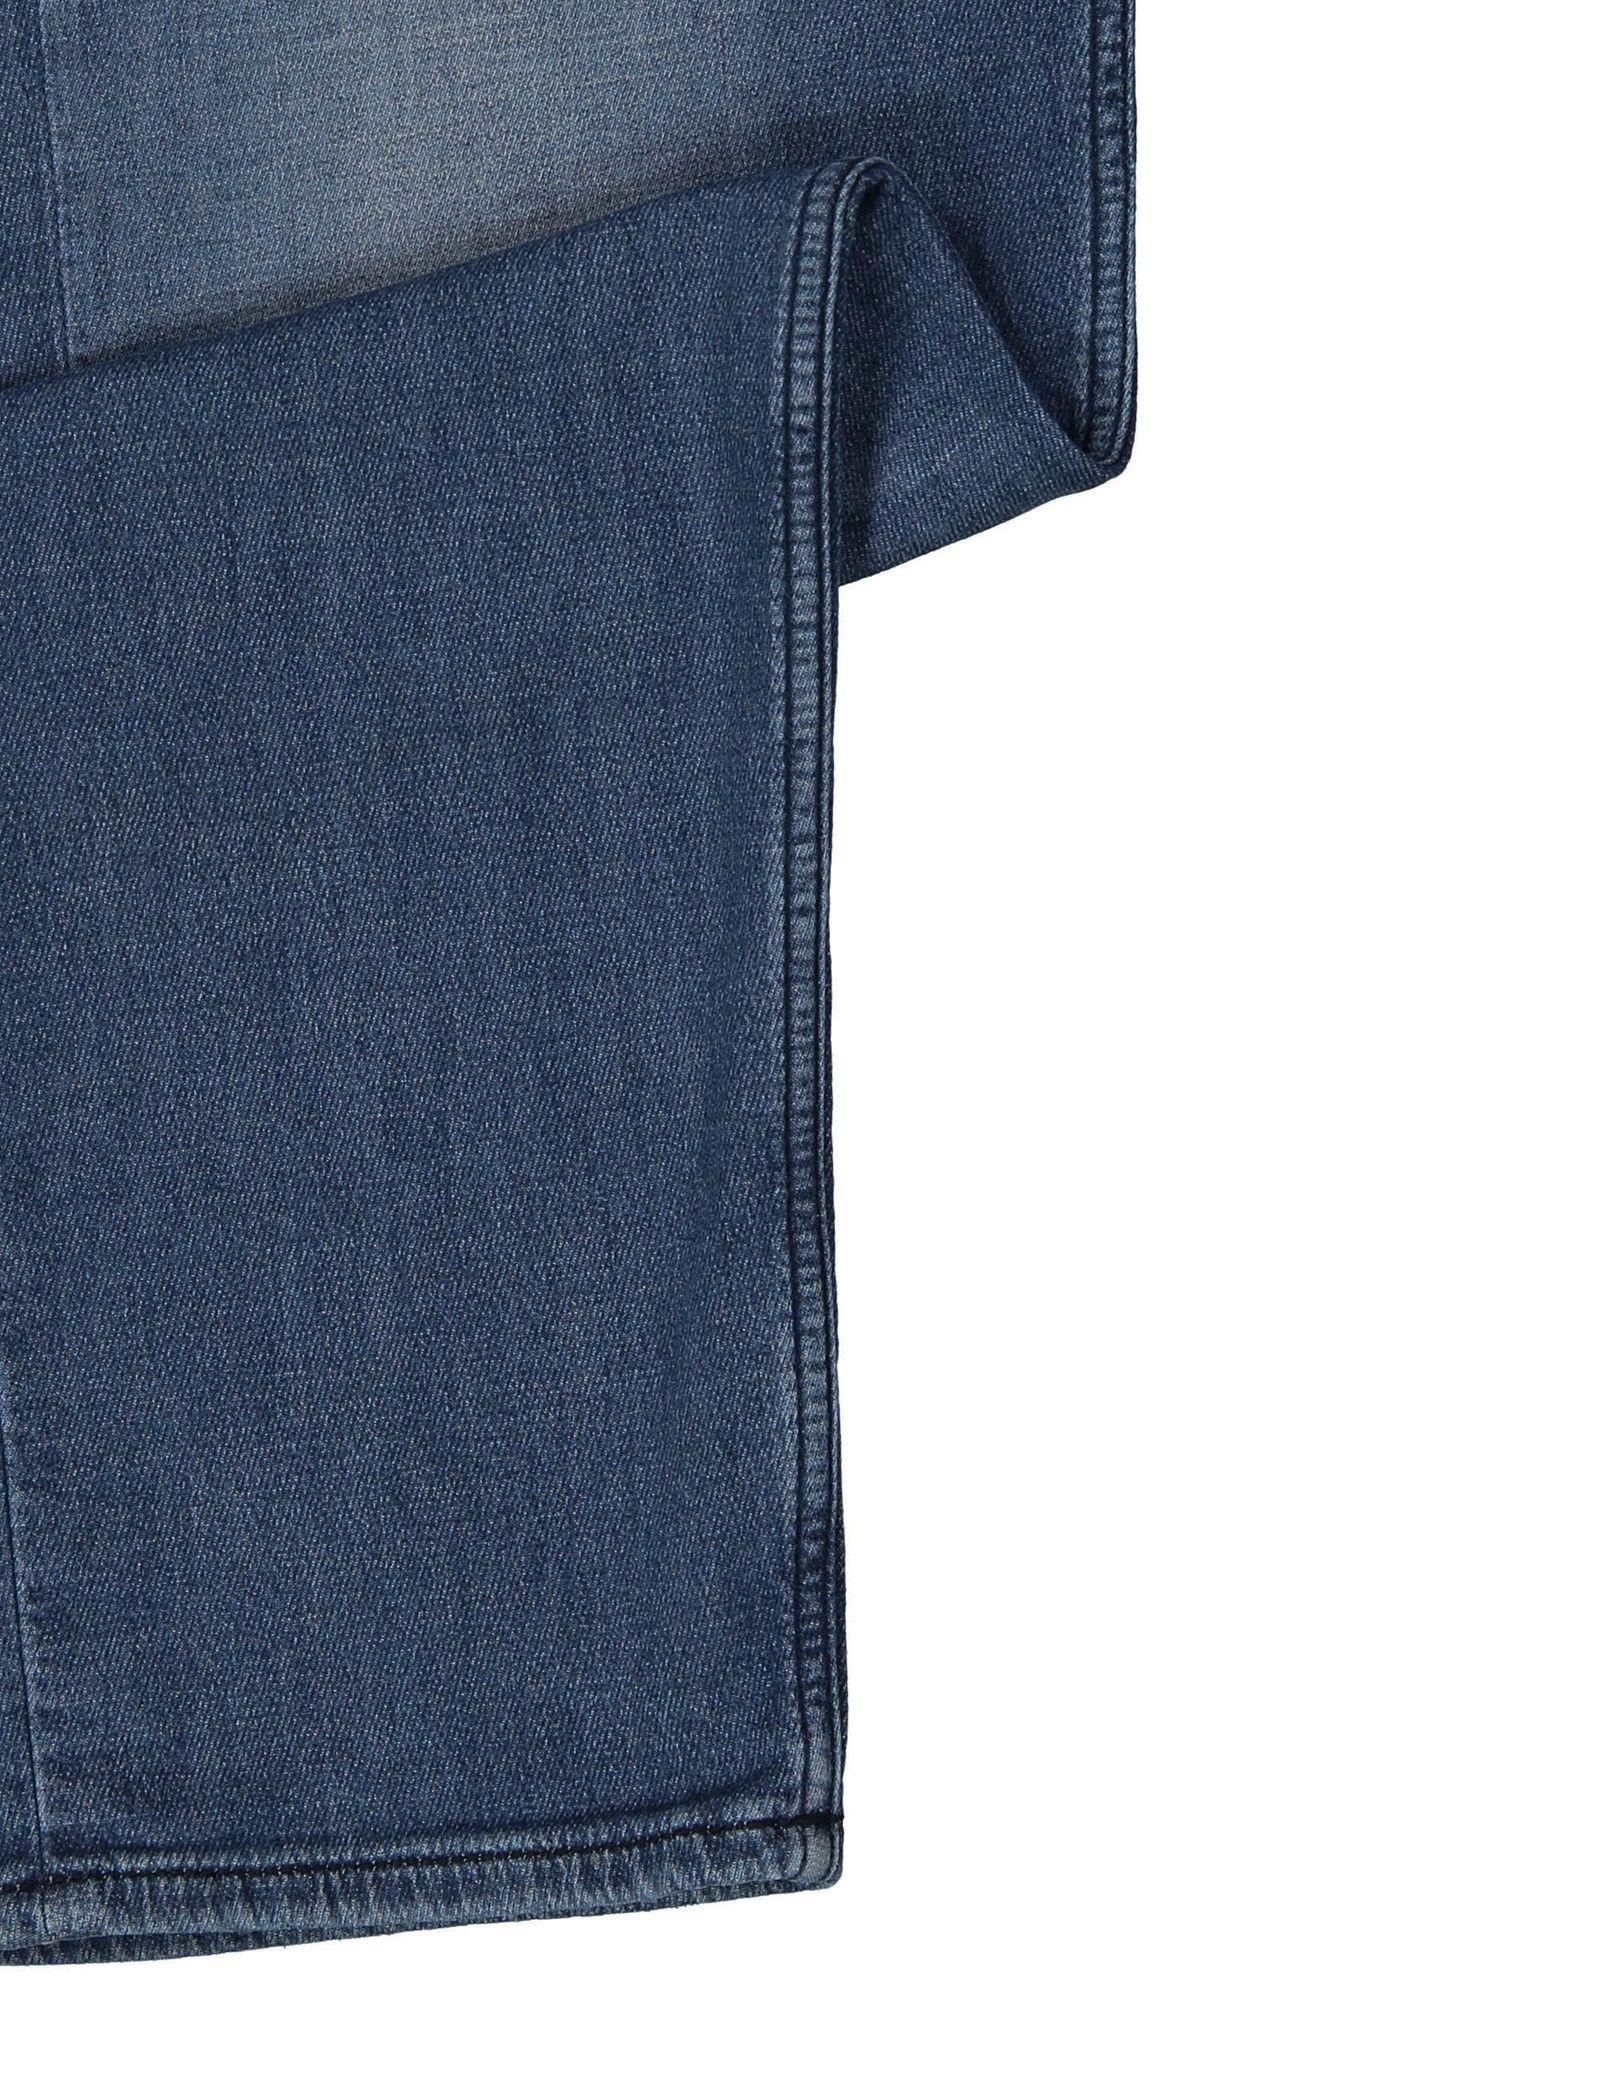 شلوار جین راسته مردانه Orange90-P SUAVE - باس اورنج - آبي تيره - 8